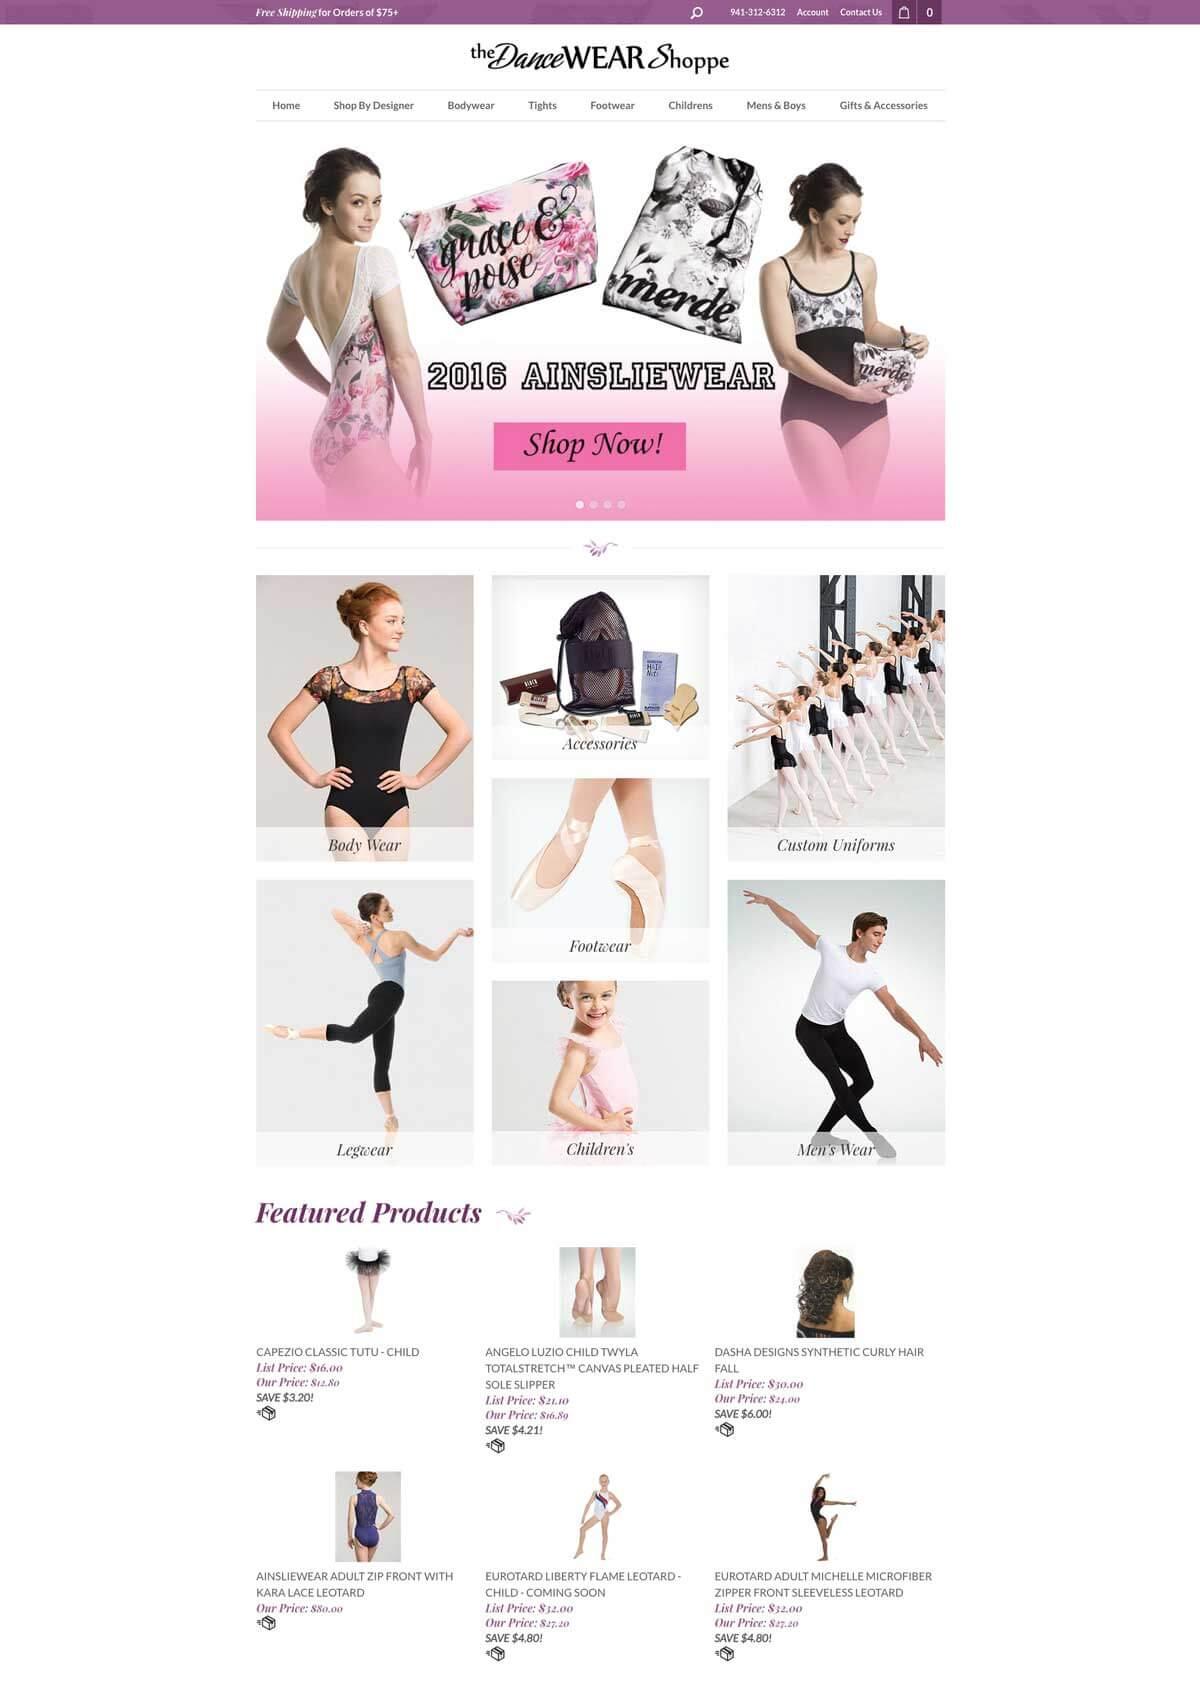 The Dancewear Shoppe